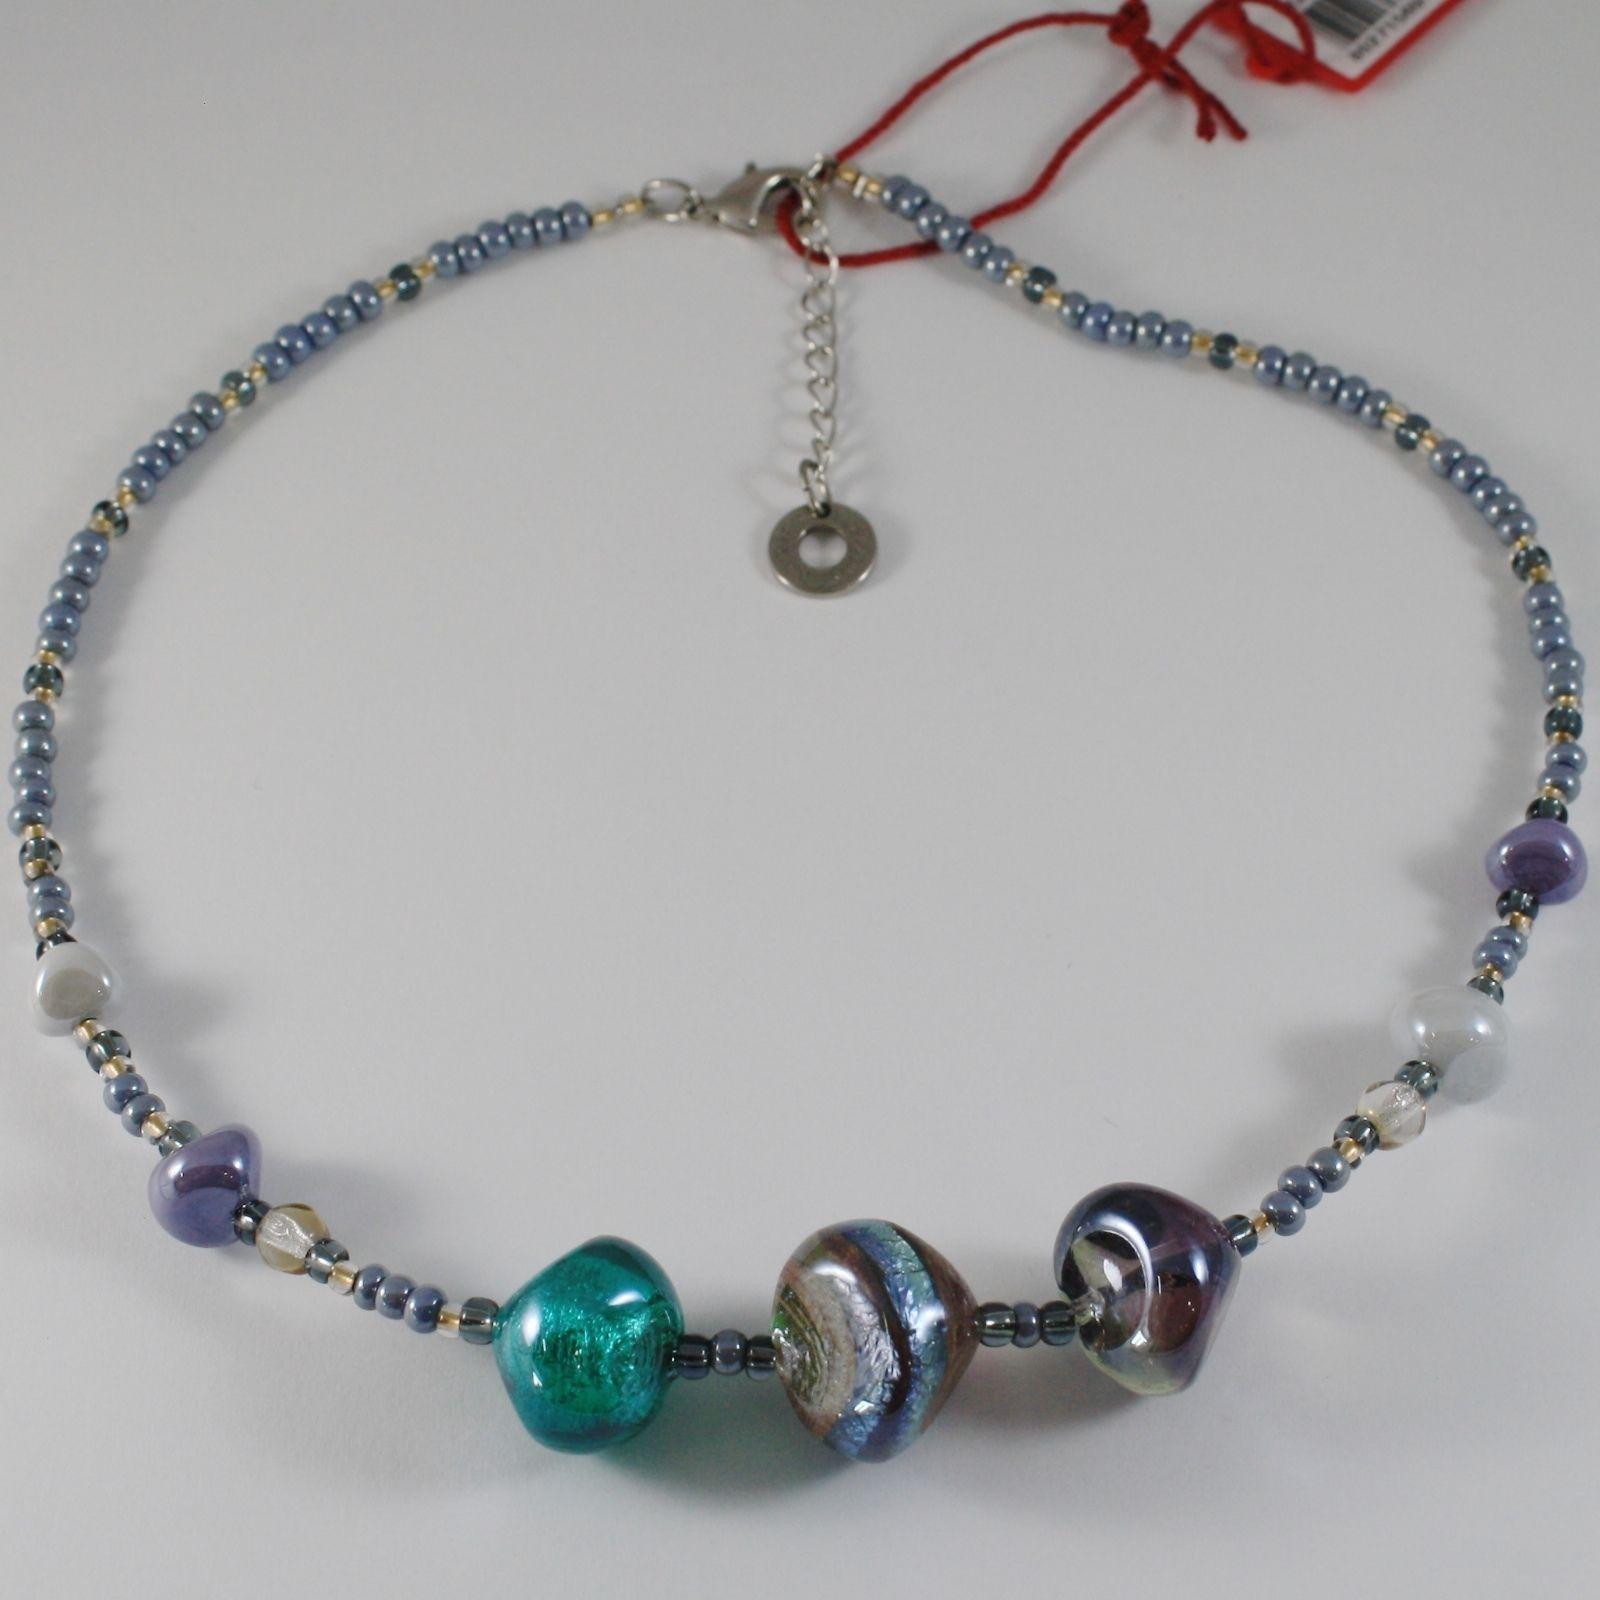 NECKLACE ANTICA MURRINA VENEZIA WITH MURANO GLASS BLUE GREEN GRAY CO985A07